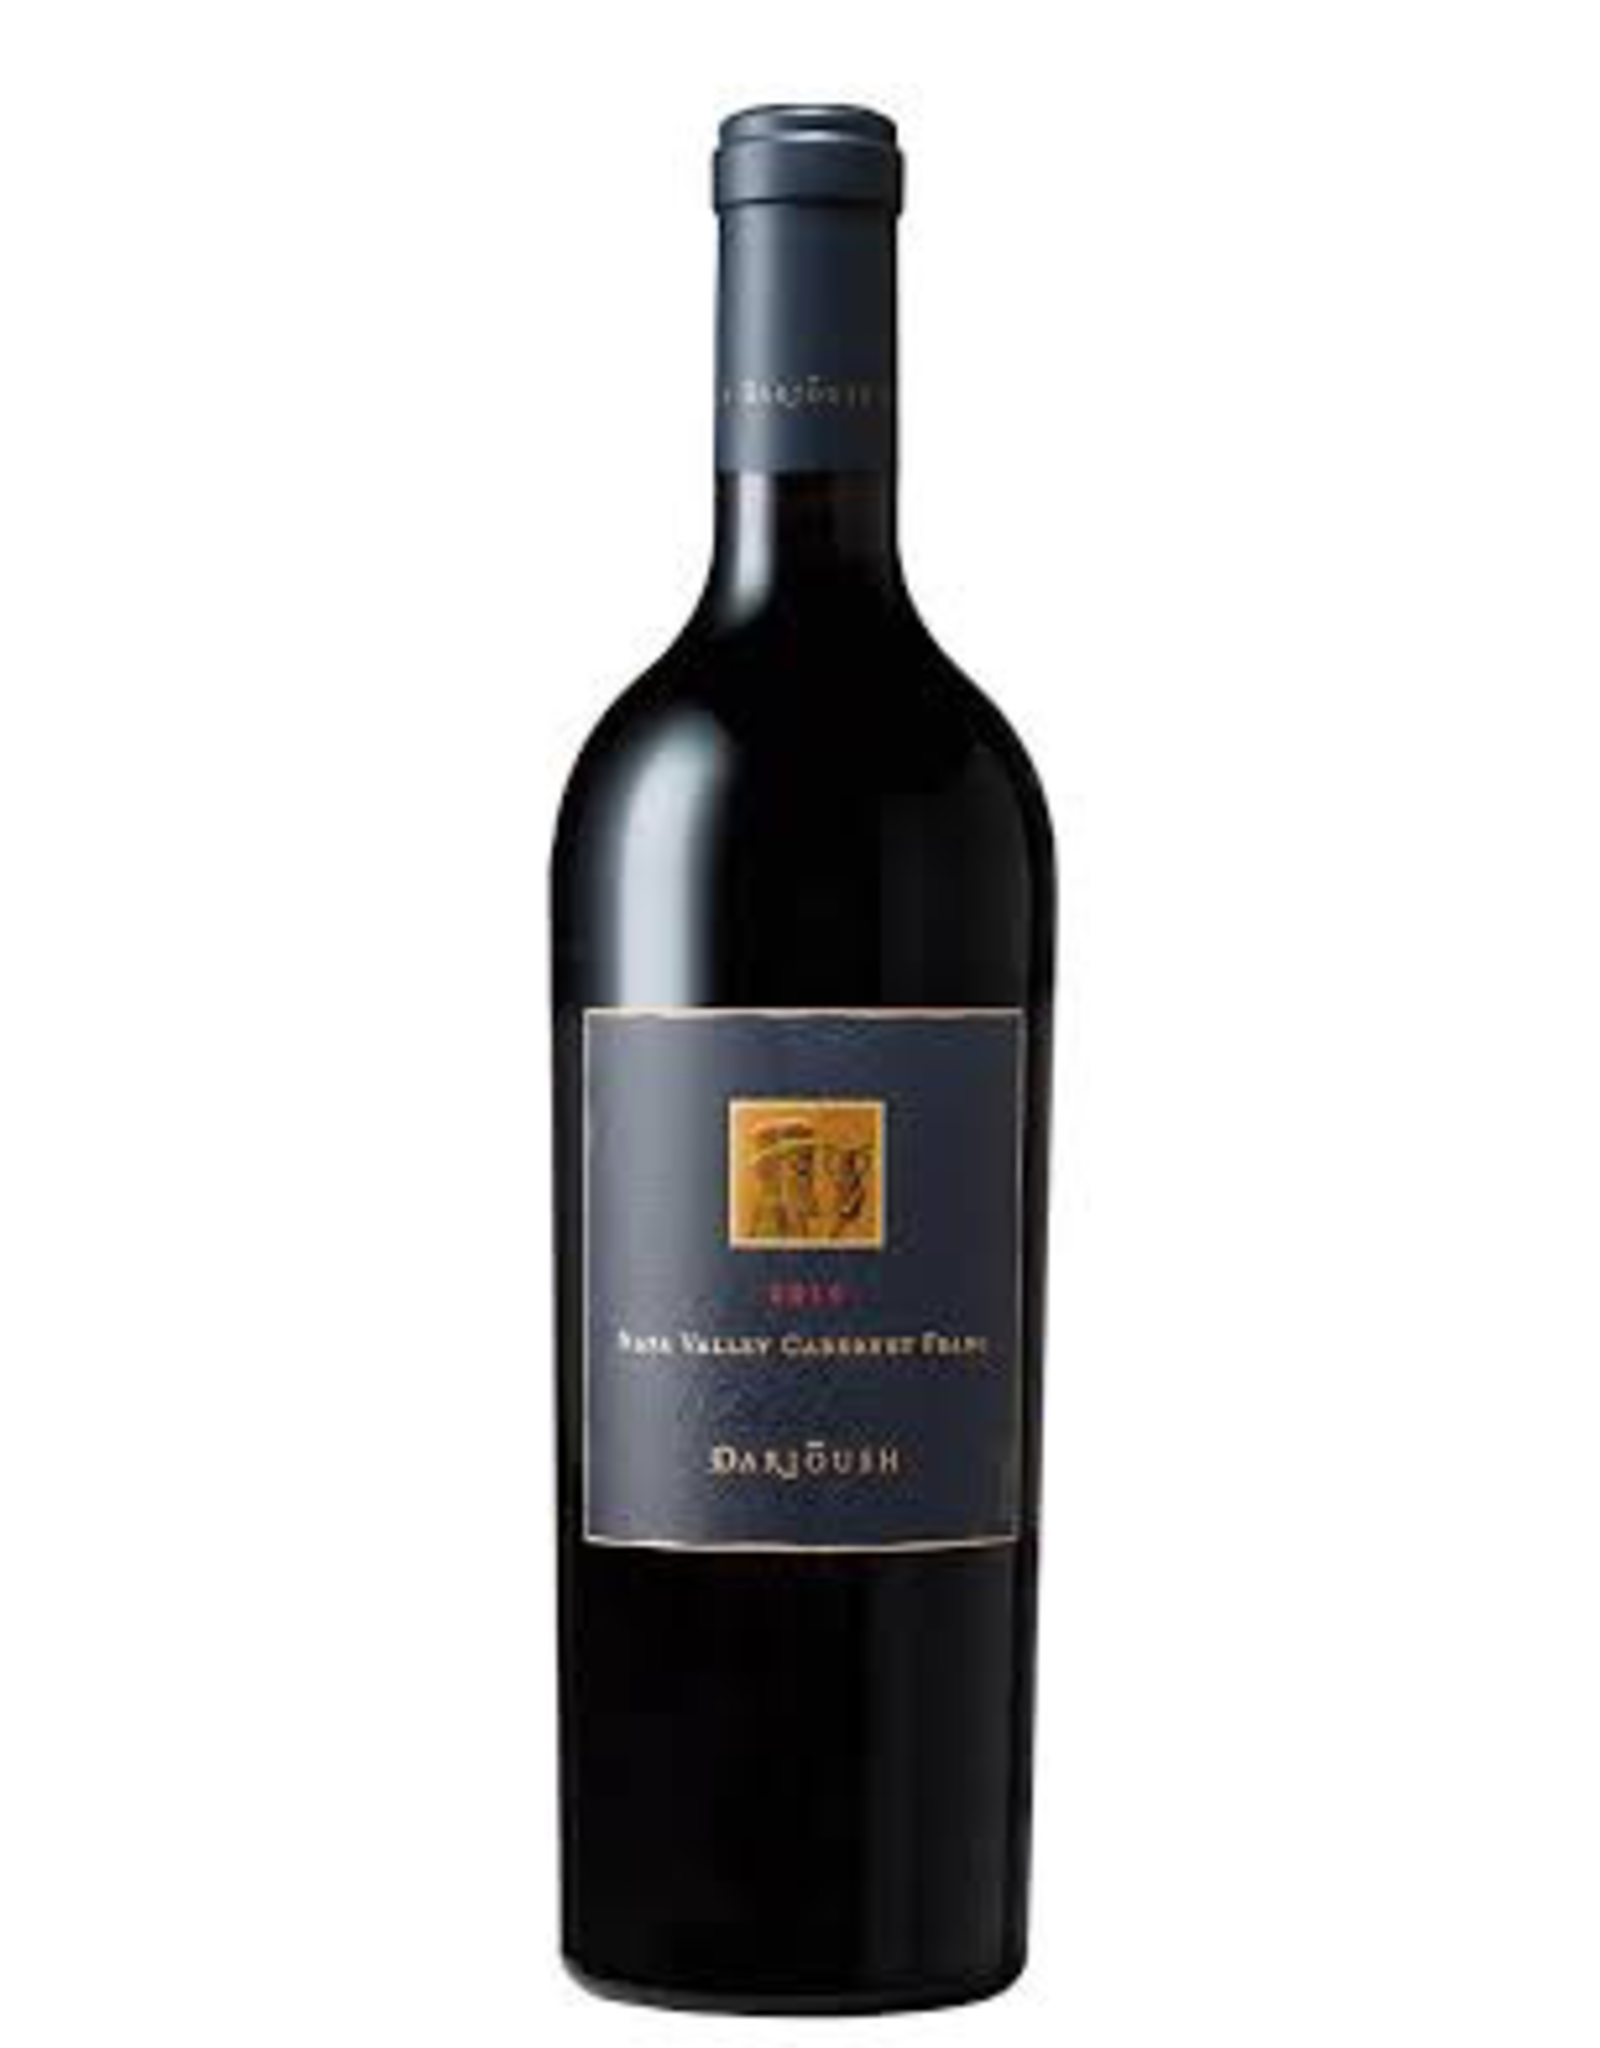 Red Wine 2016, Darioush, Cabernet Franc, Mt. Veeder, Napa Valley, California, 14.8% Alc, CTnr